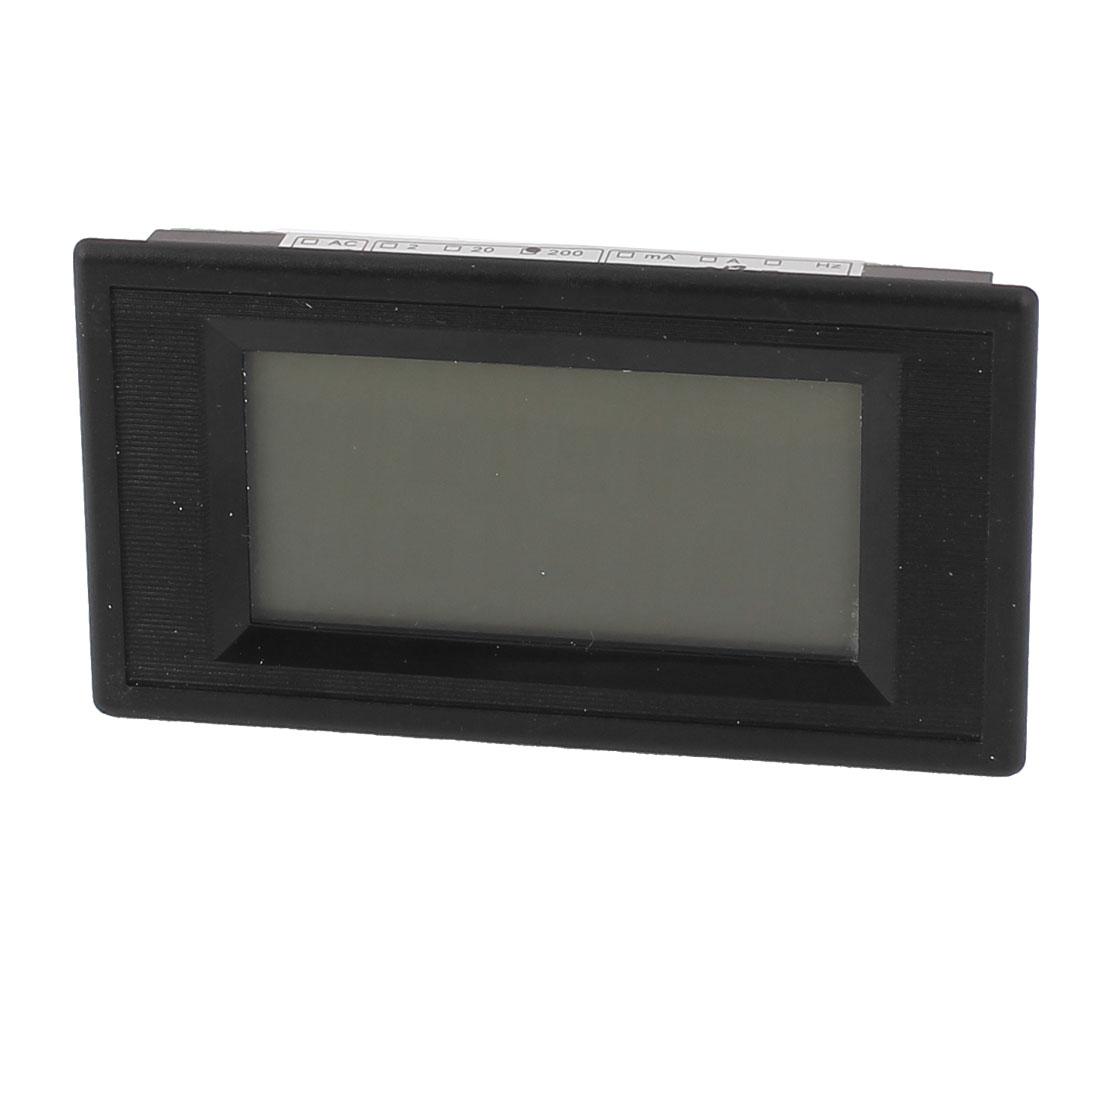 AC/DC 8-12V Blue Backlight Digital Panel LCD Display Resistance Meter Tester Counter 0-200 Ohm